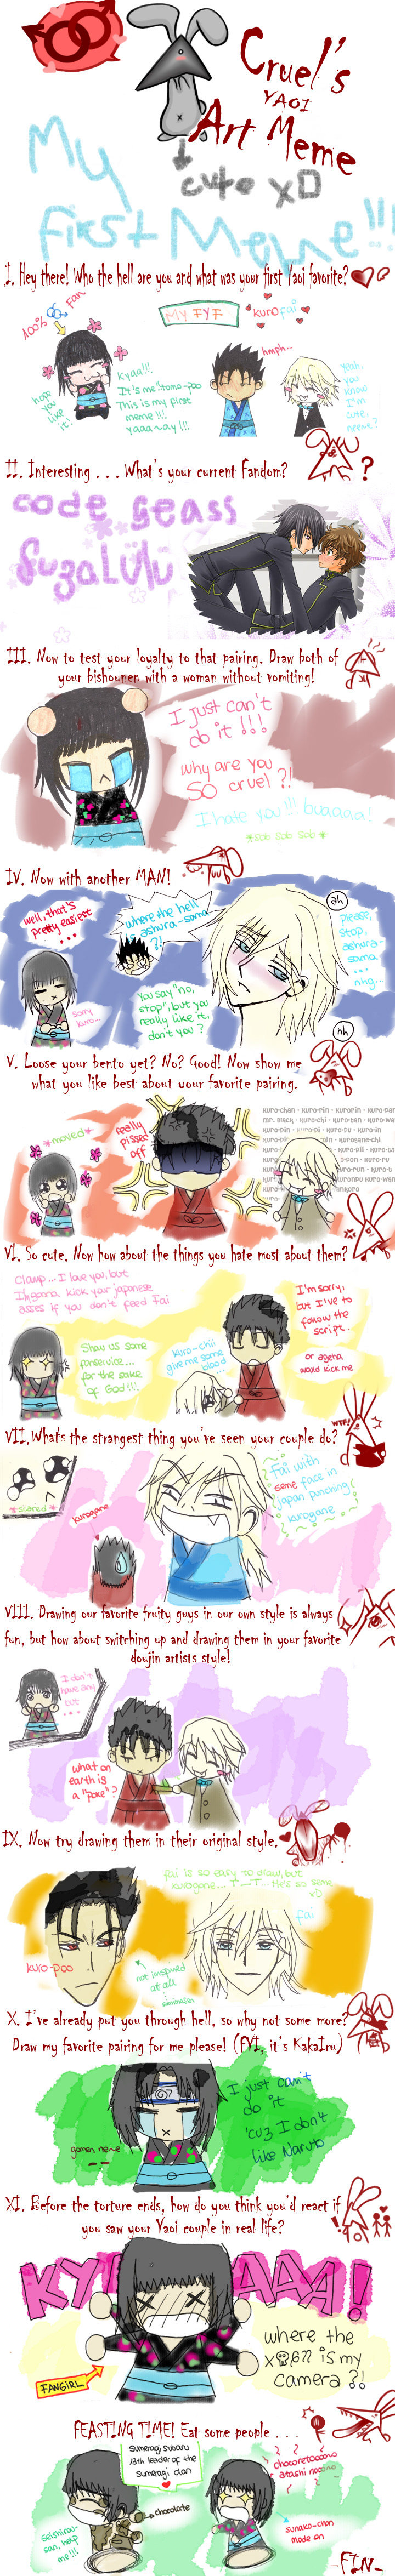 Mis Dibujos! =3  //voy progresando de a poquito// - Página 2 My_cruel_yaoi_meme_kurofai_by_Tomo_poo